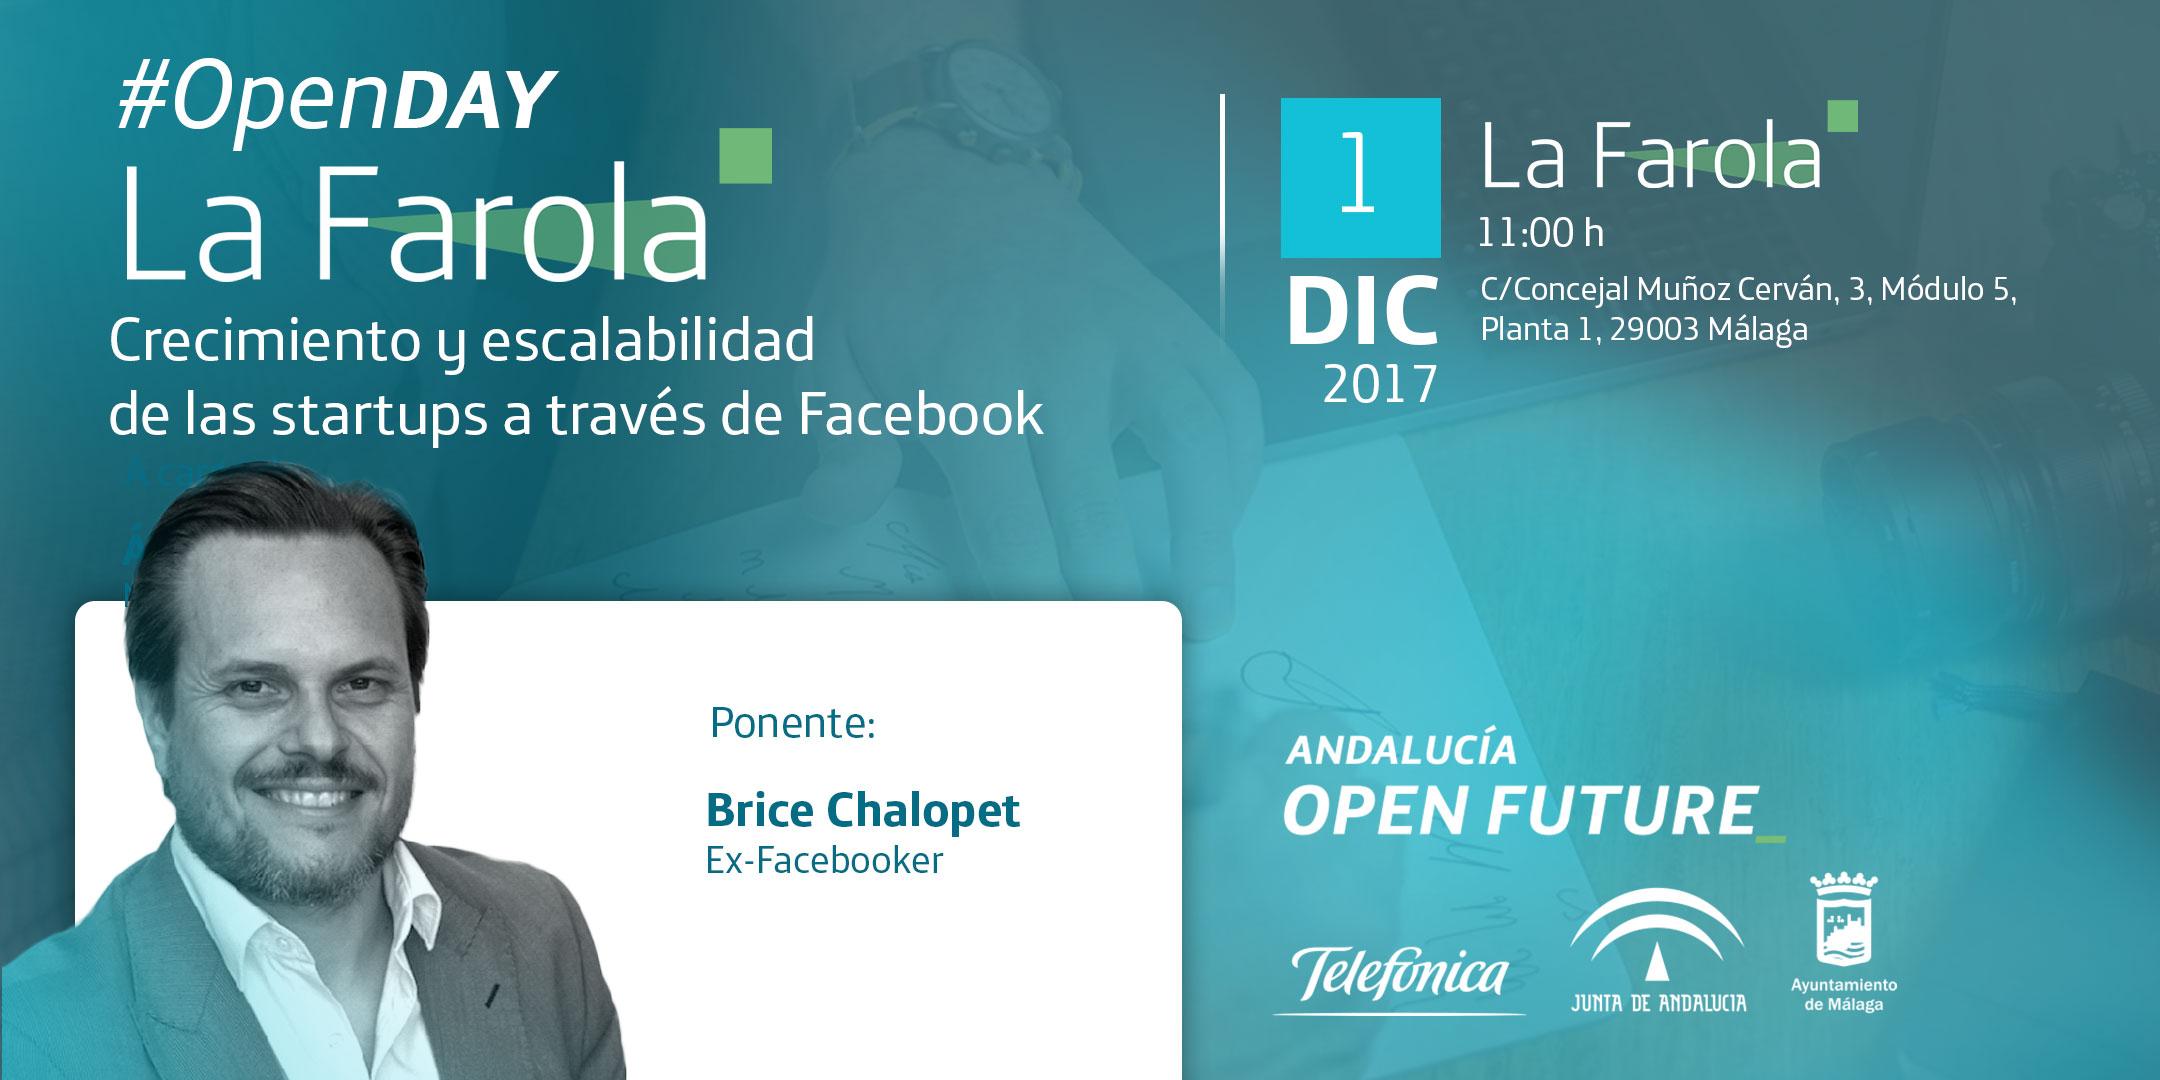 Open Day en La Farola con Brice Chalopet